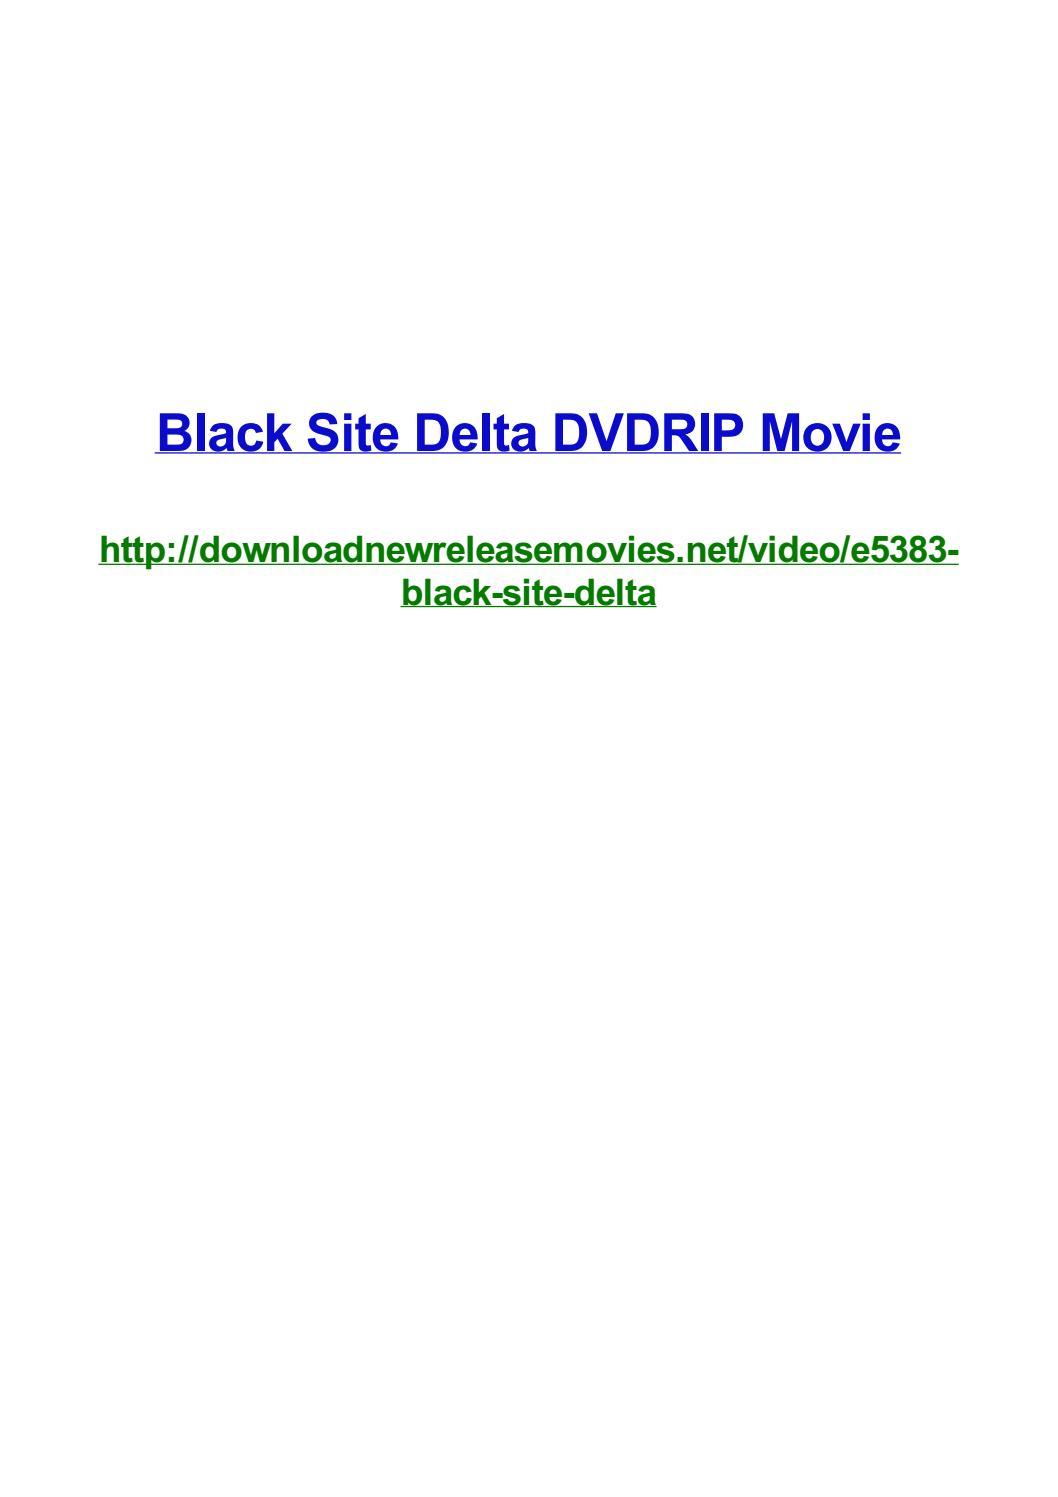 Jadwal Cinemaxx Wtc : jadwal, cinemaxx, Black, Delta, Dvdrip, Movie, Frank, Seamons, Issuu